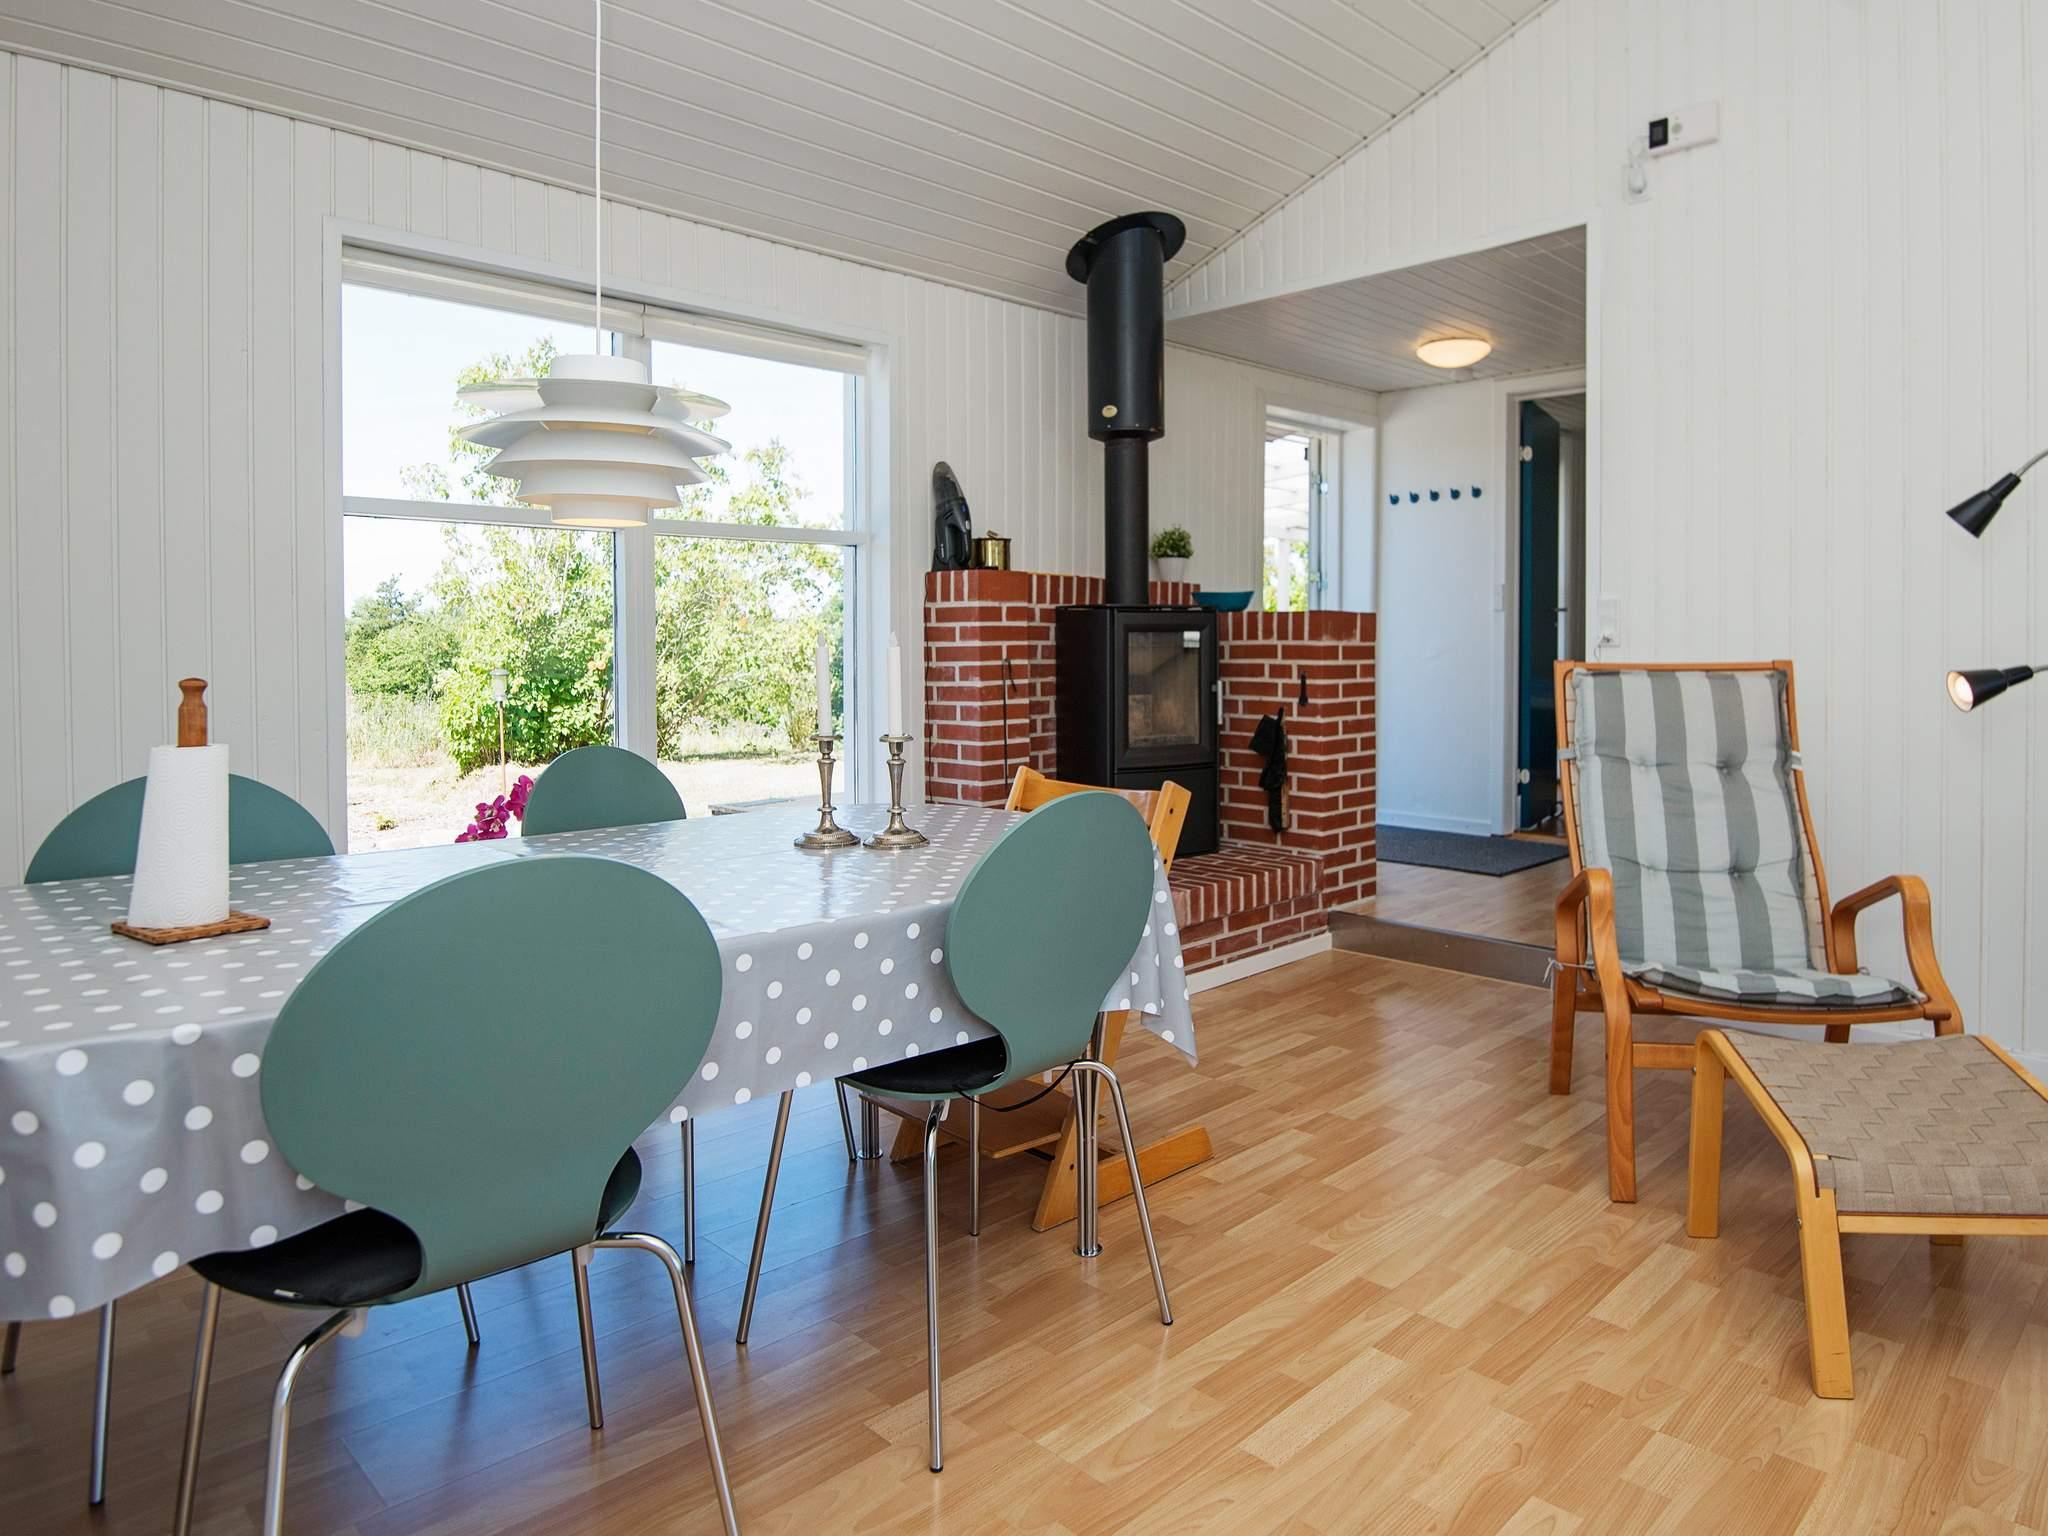 Maison de vacances Helgenæs (978615), Knebel, , Jutland Est, Danemark, image 3